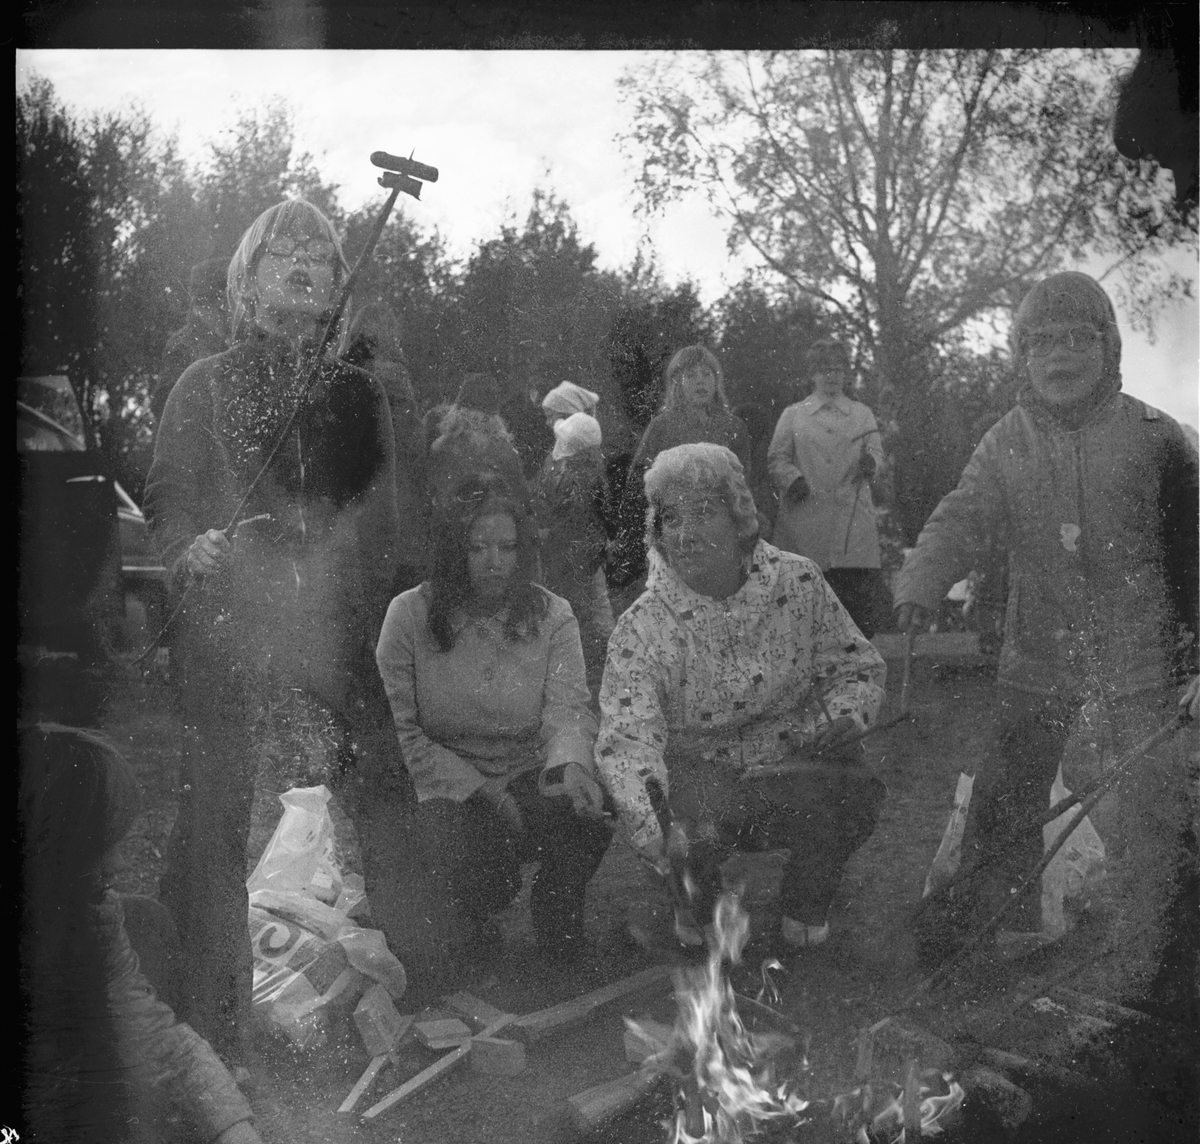 Skogsmulleavslutning Oktober 1972